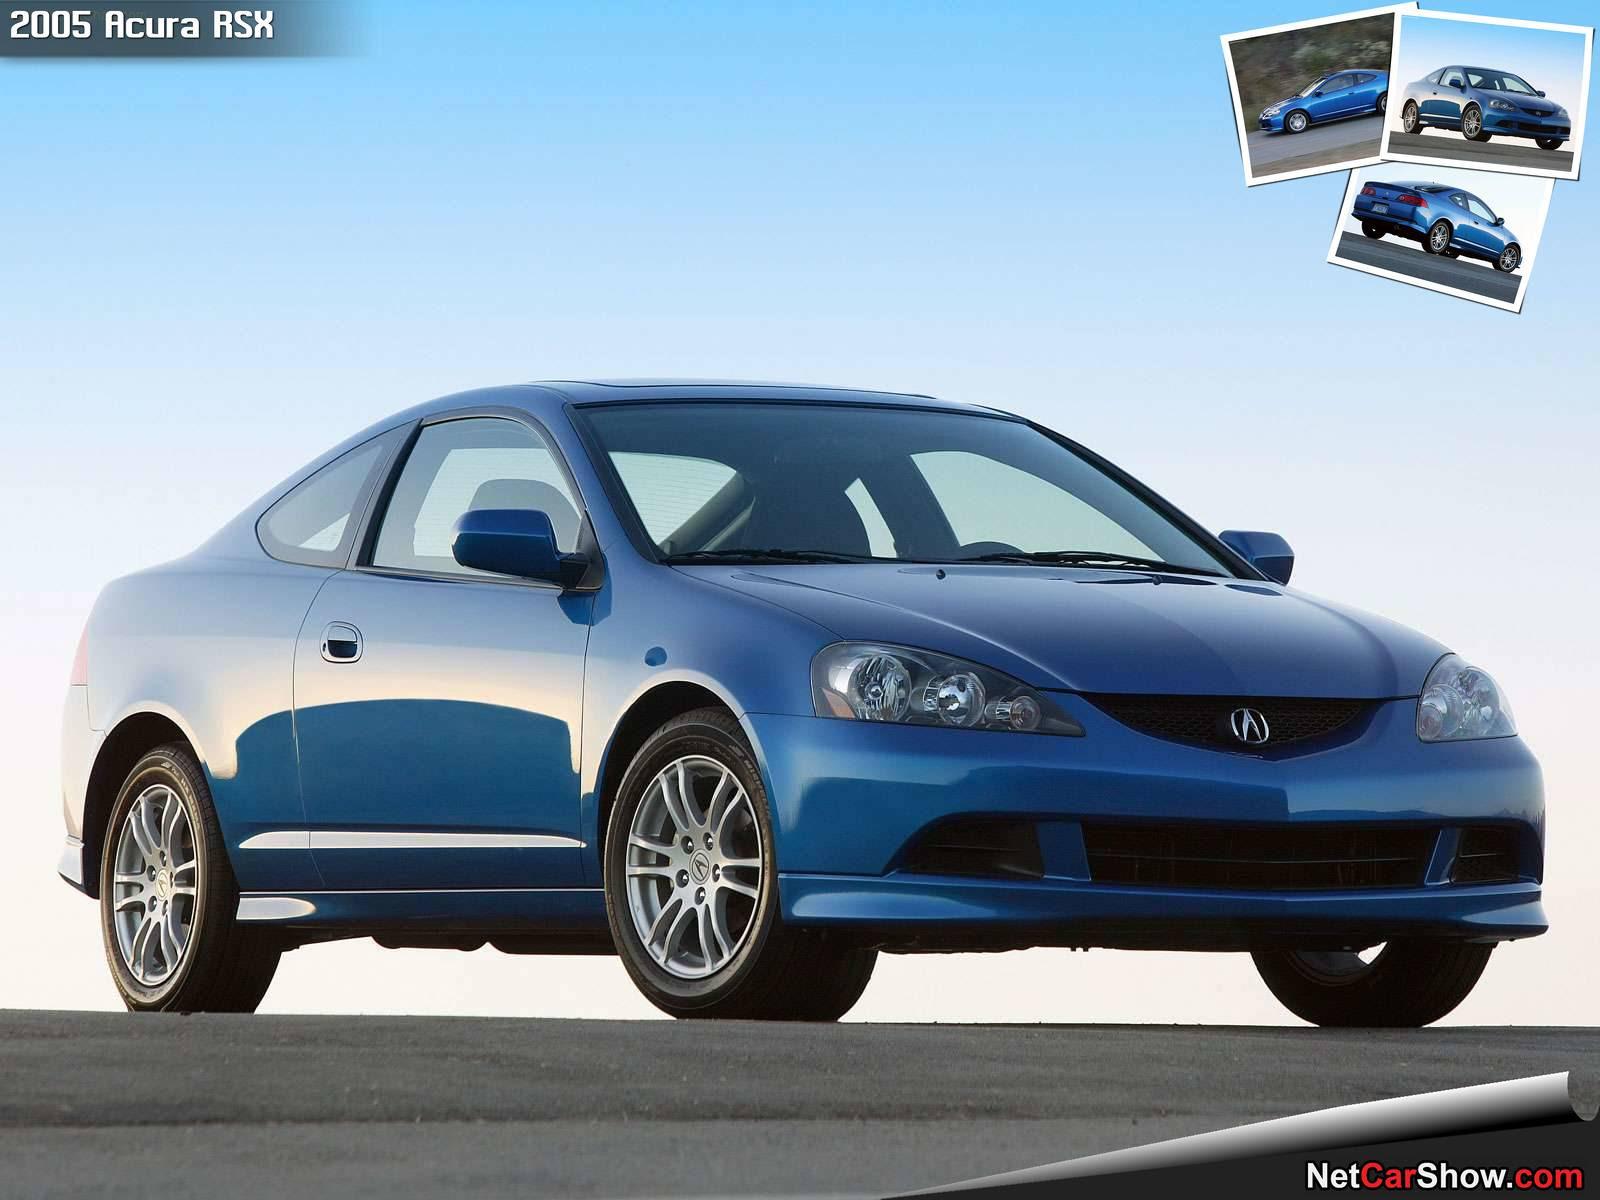 Acura RSX (2005)